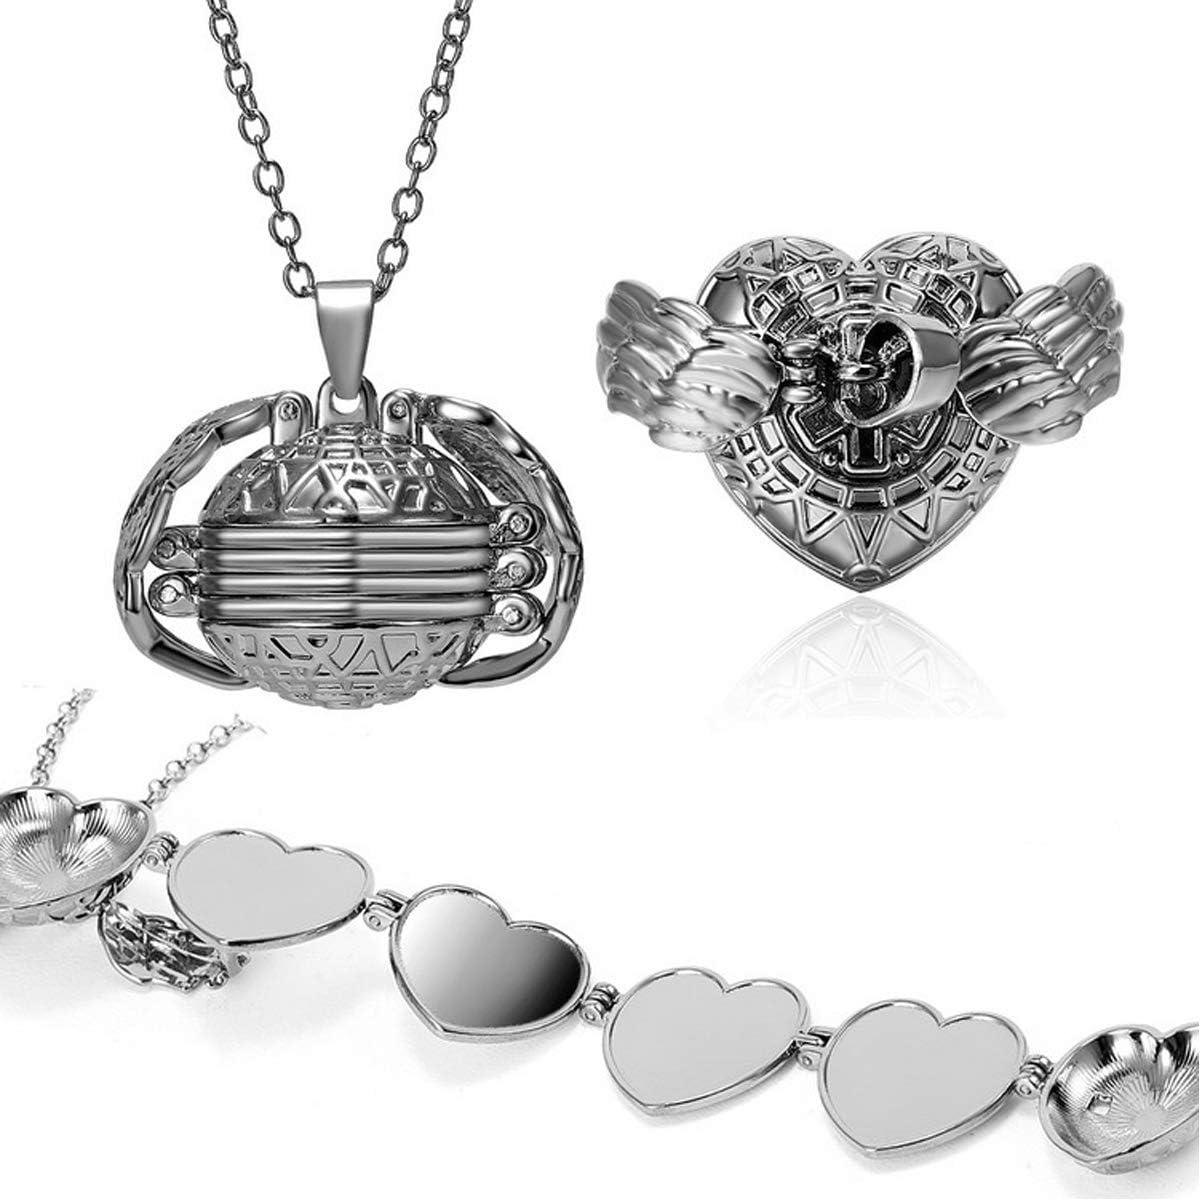 JO WISDOM Expanding Photo Locket Necklace Heart Photo Pendant Ball Locket with Wing Design